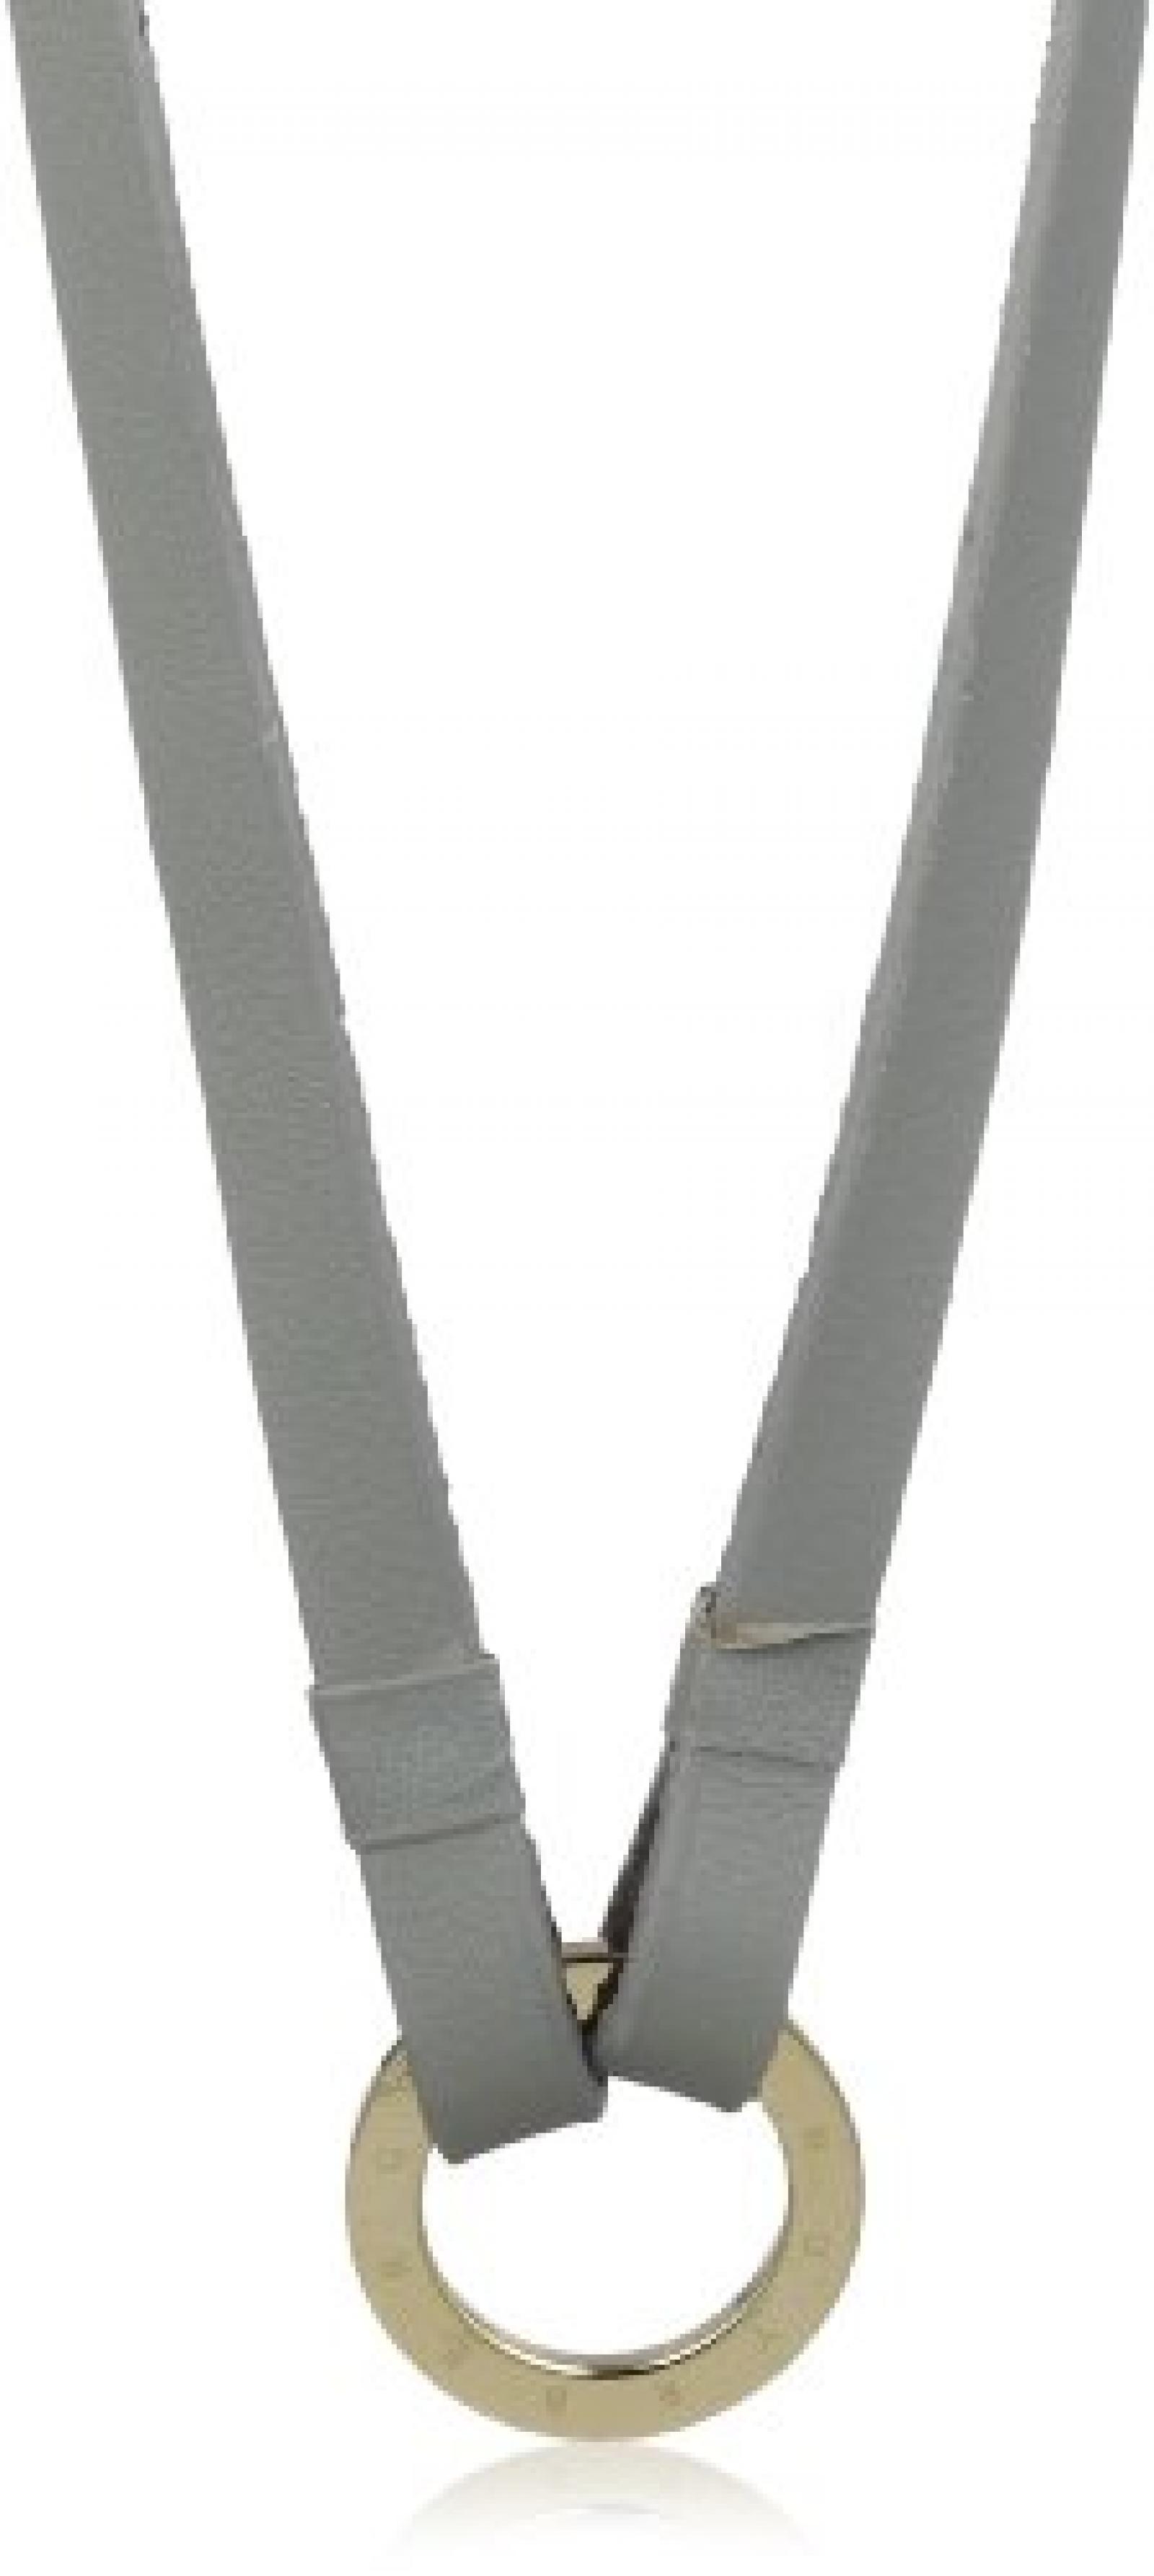 Dyrberg/Kern Damen-Lederhalskette GIMME SG GREY 80cm 332354